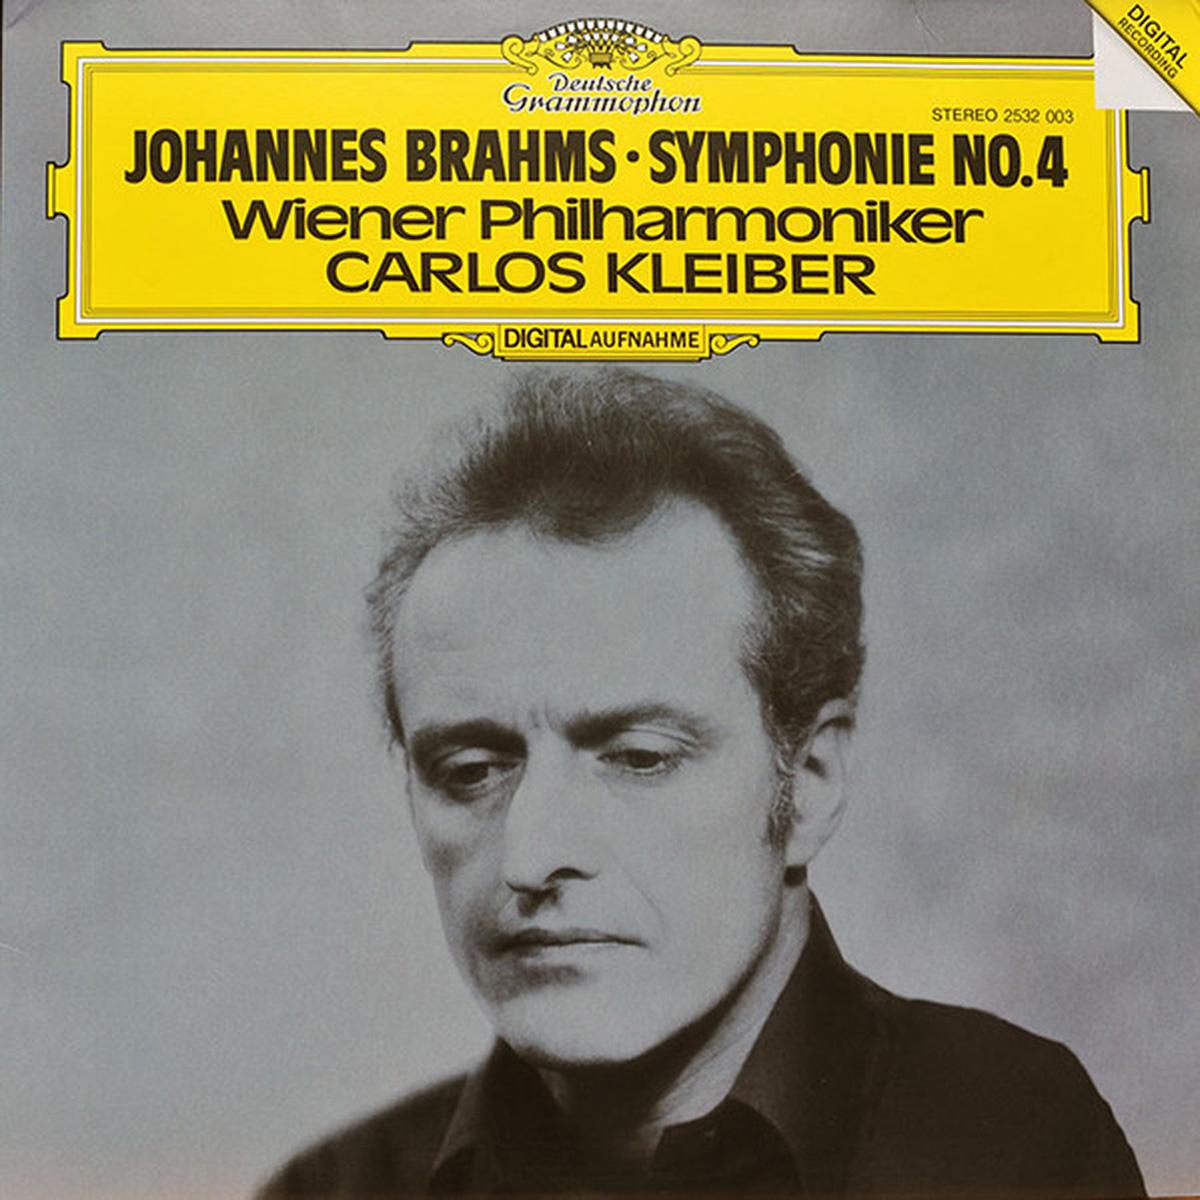 DGG 2532003 Brahms Symphonie 4 Kleiber